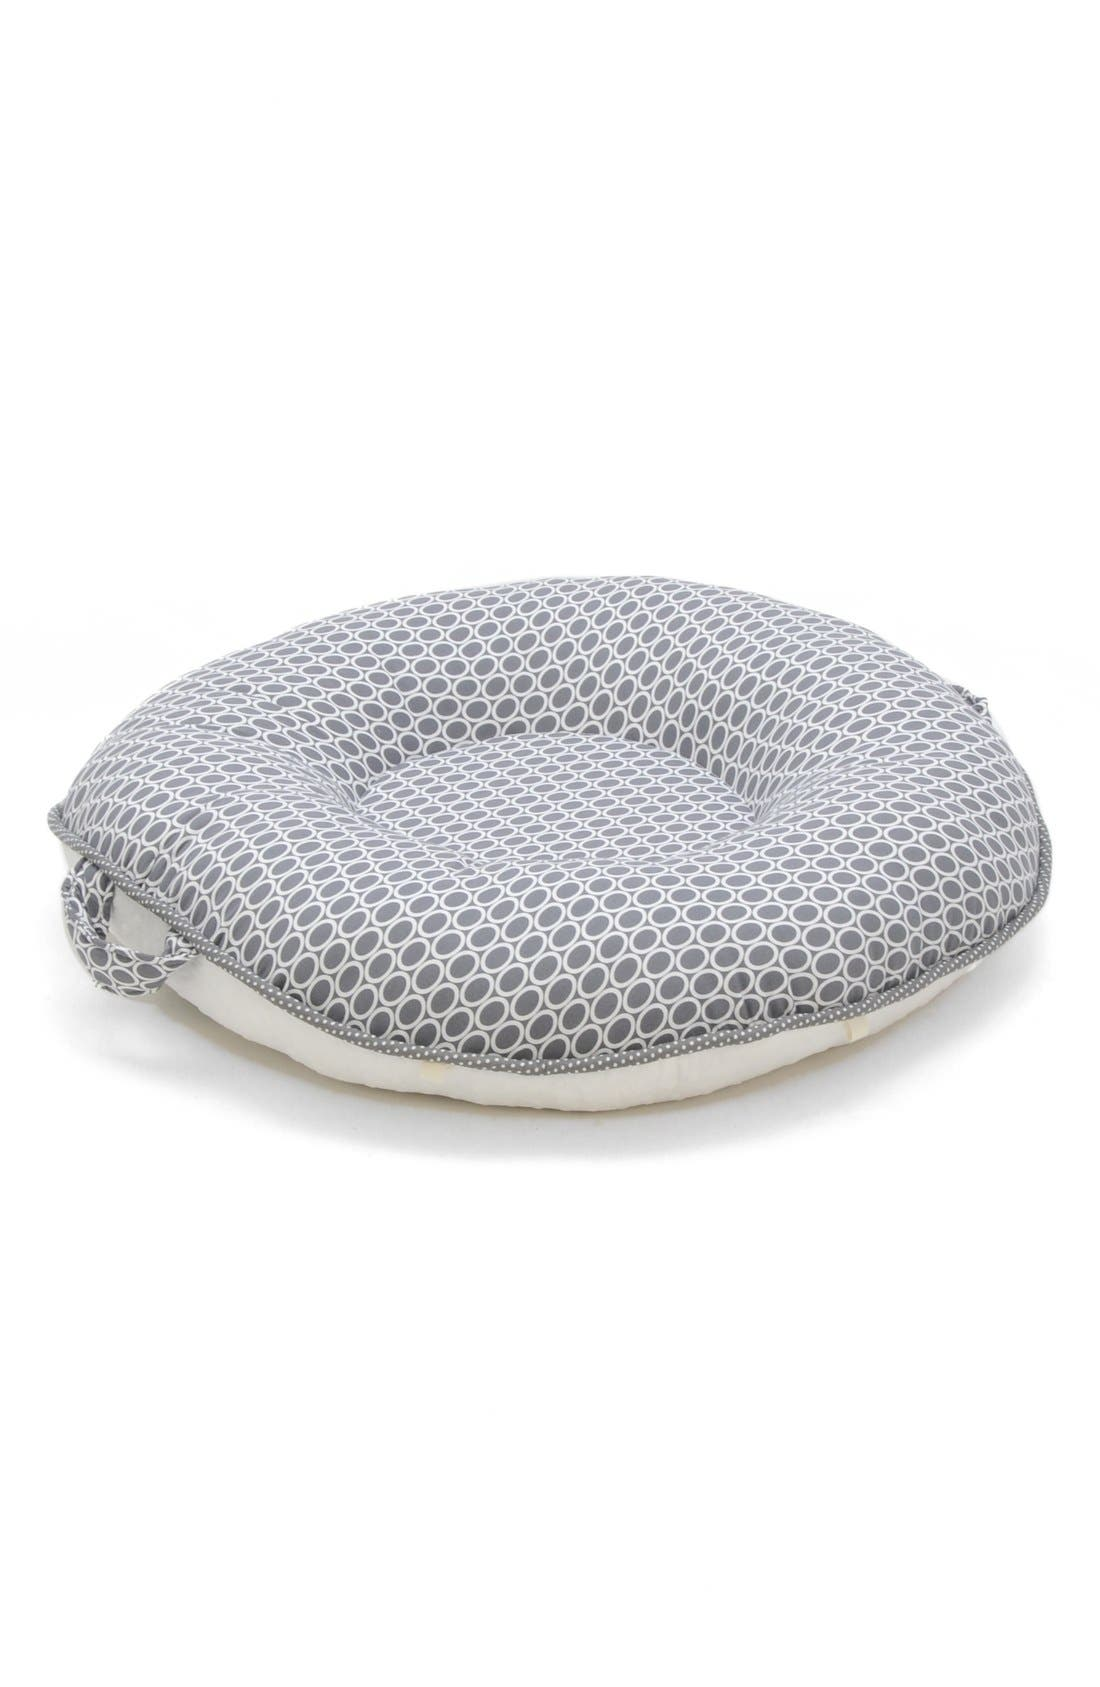 'Majestic' Portable Floor Pillow,                             Main thumbnail 1, color,                             020